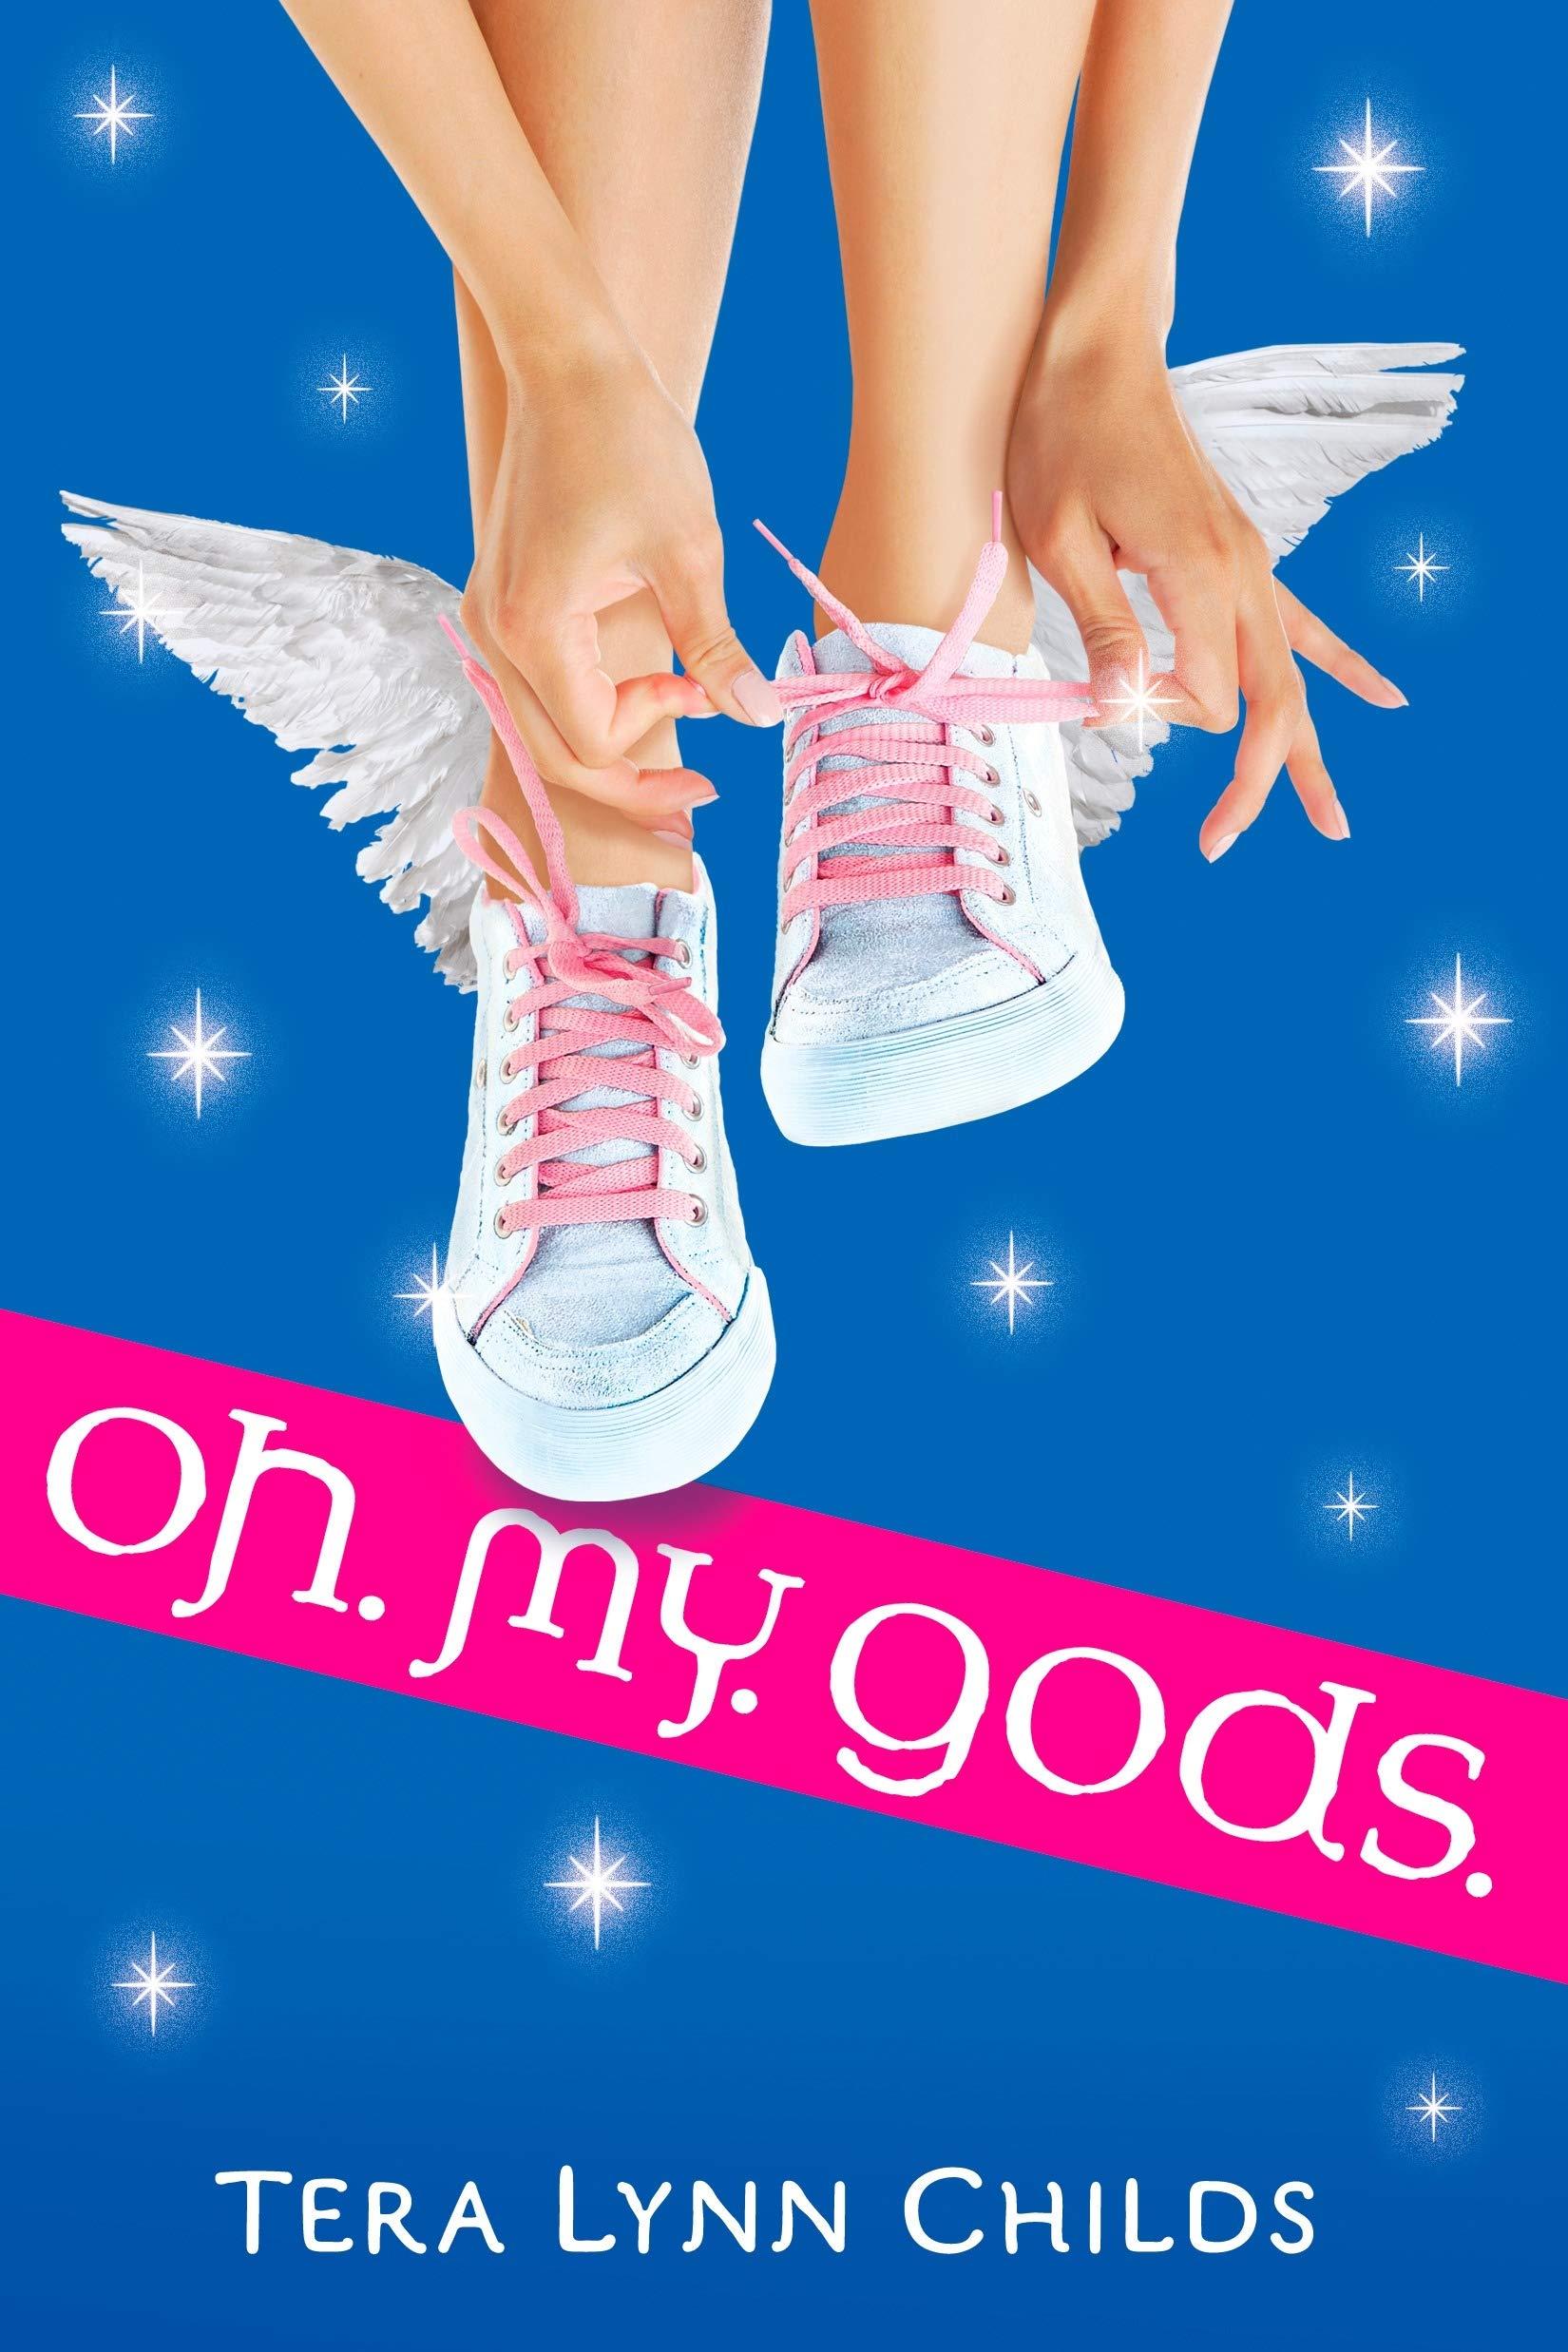 Amazon.com: Oh. My. Gods. (9780142414200): Childs, Tera Lynn: Books